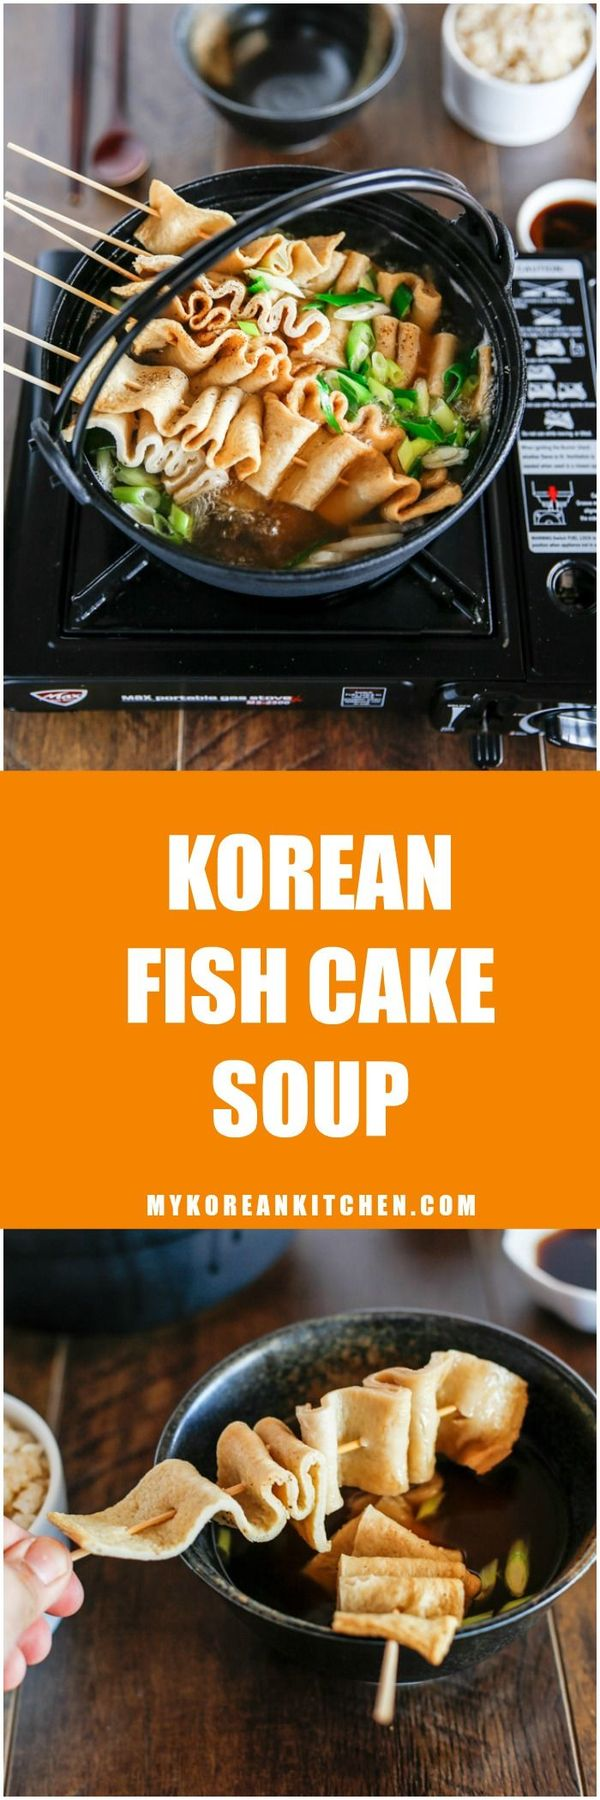 Korean Fish Cake Soup